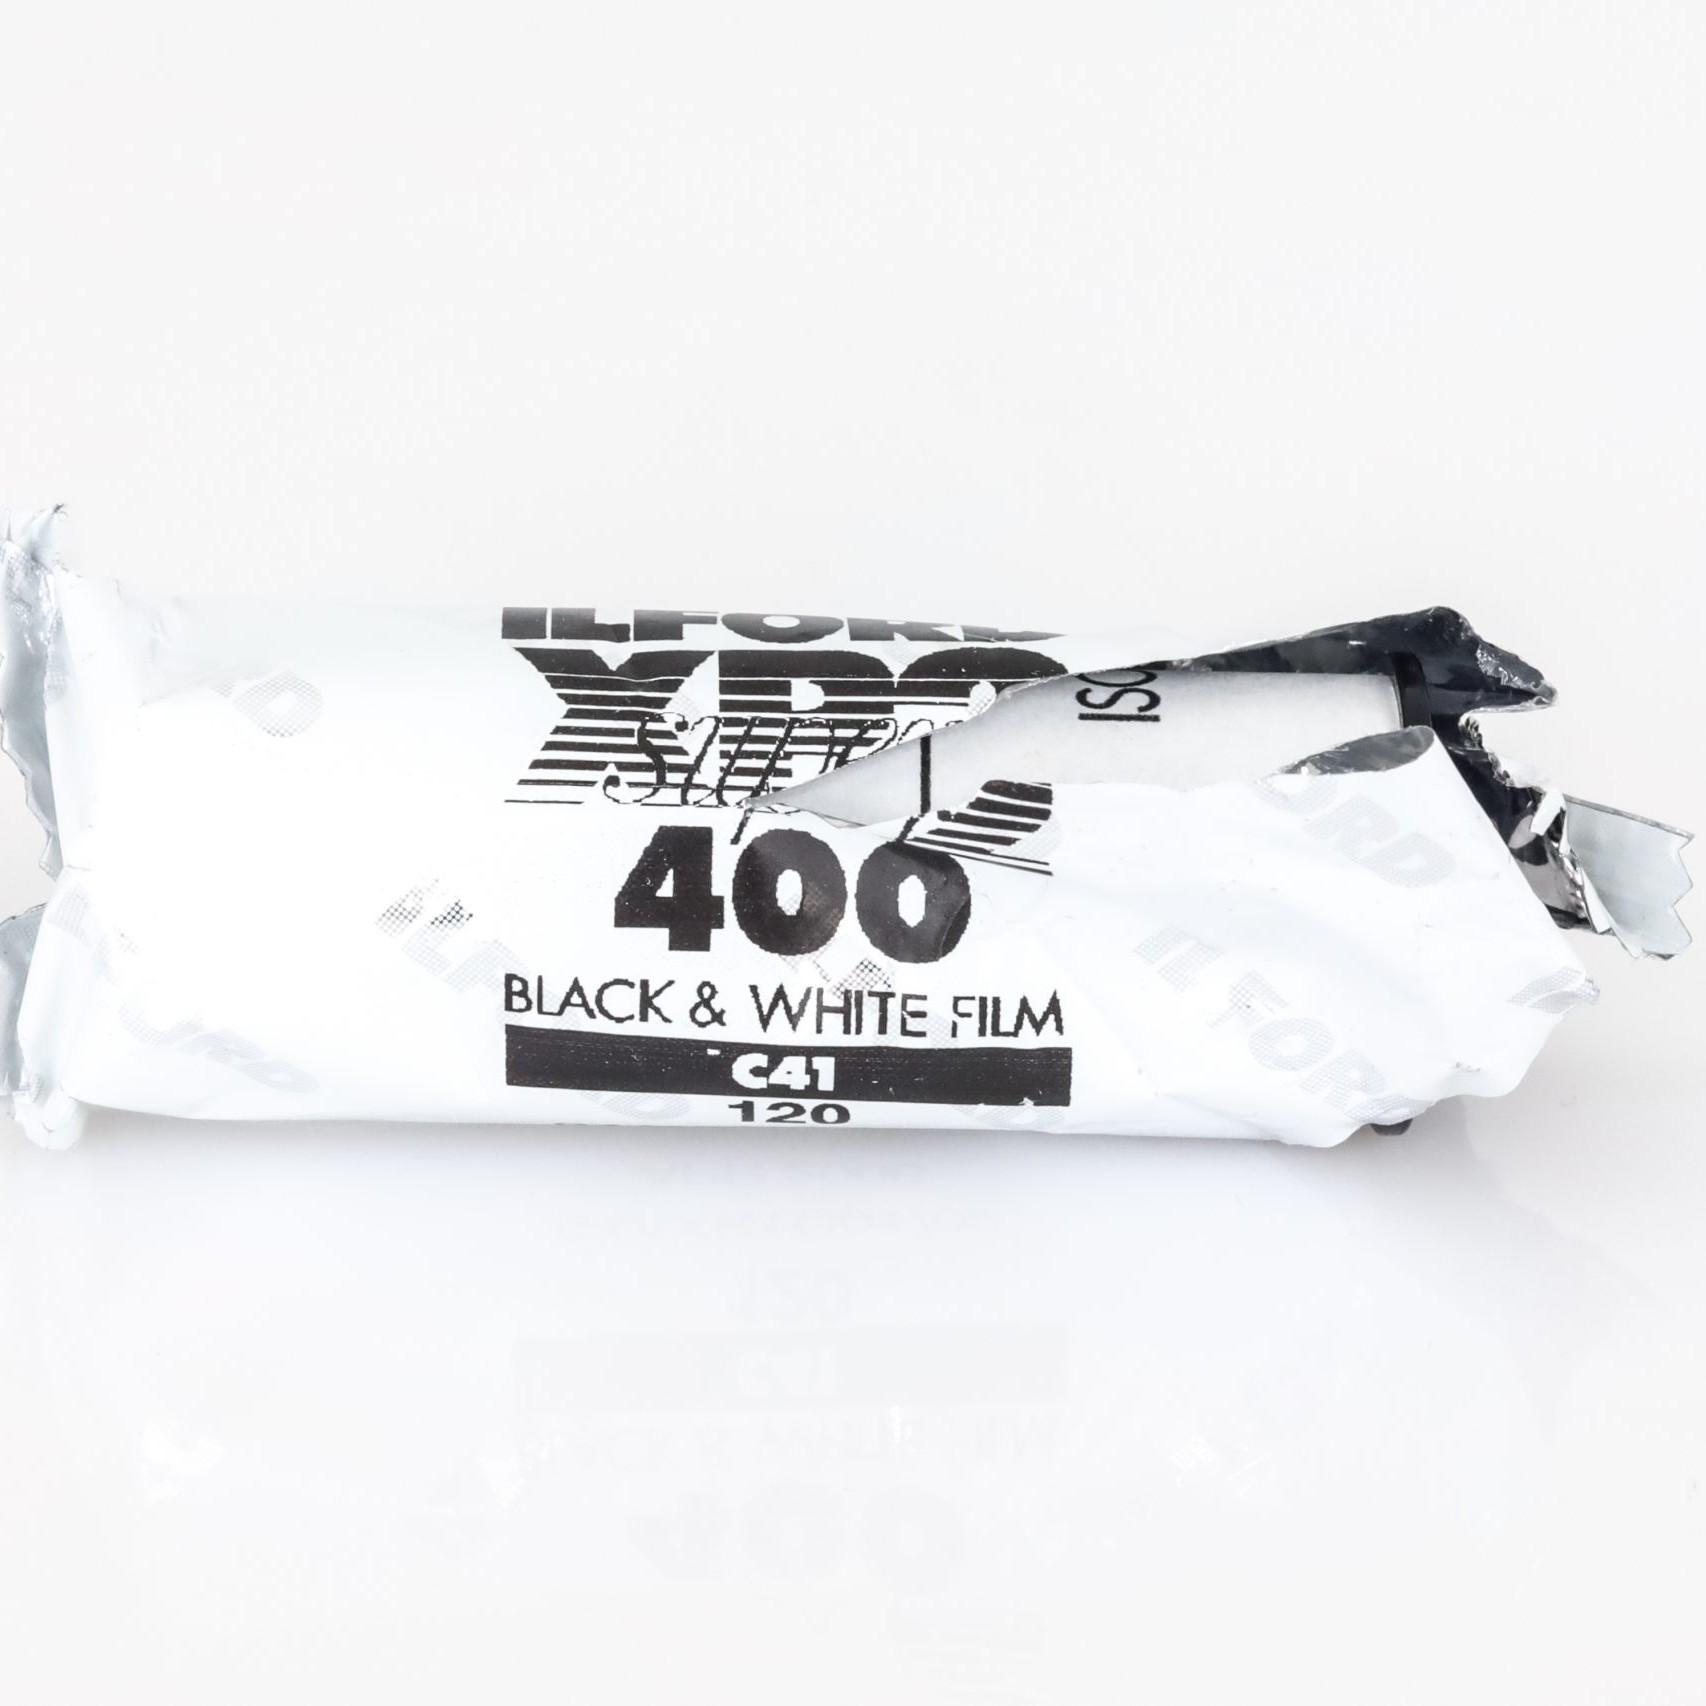 Expired Ilford XP2 Super Black and White 120 Medium Format Film